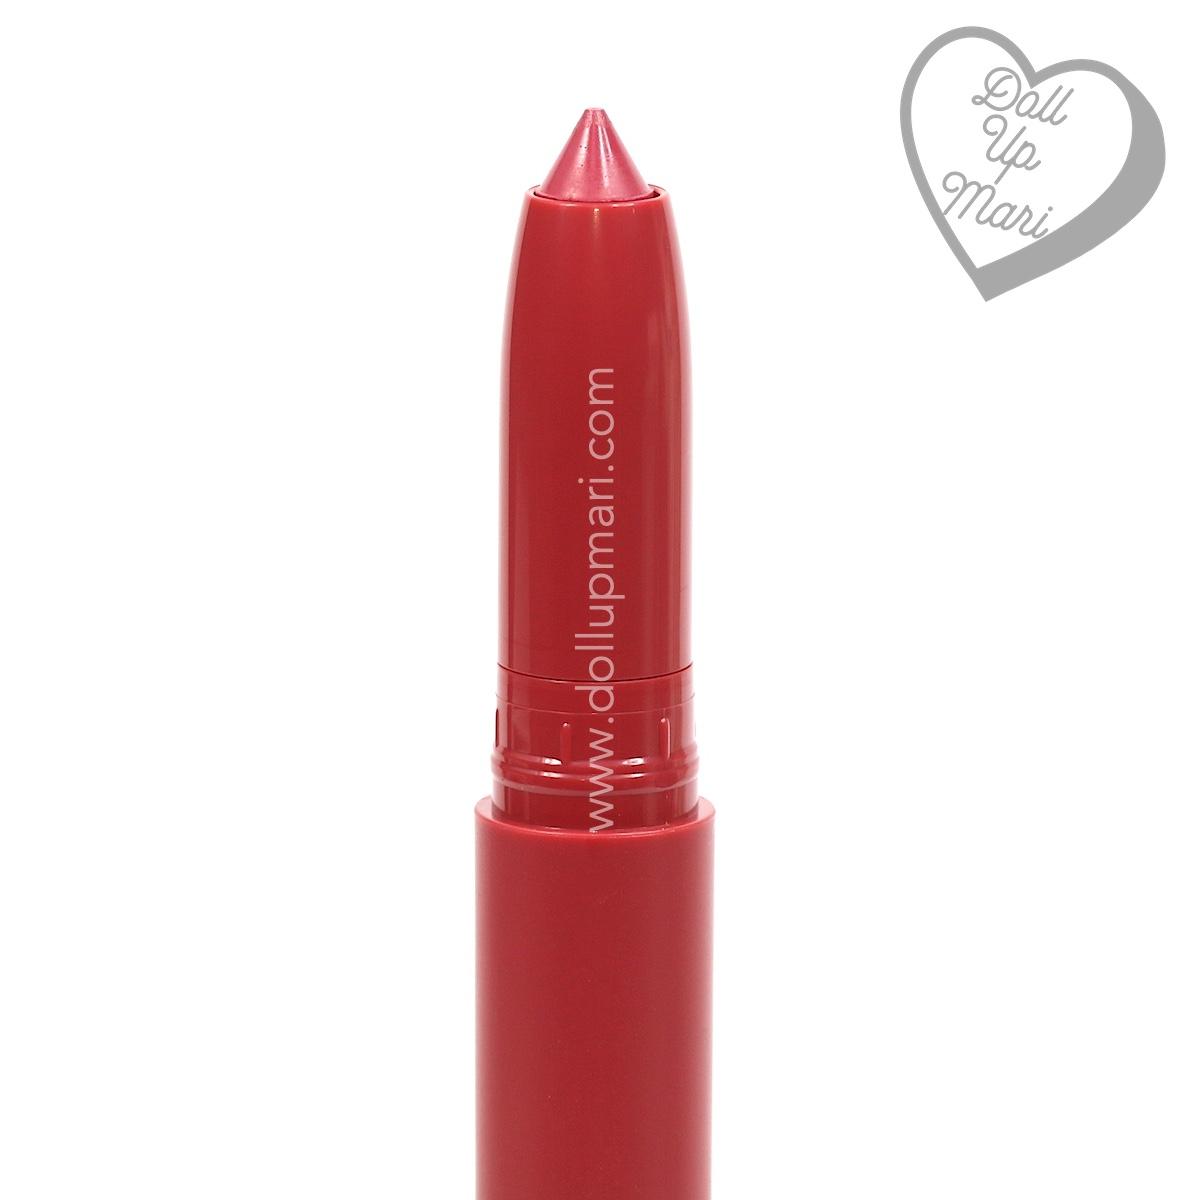 75 speak your mind shade of Maybelline Superstay Ink Crayon 8HR Longwear Matte Lipstick